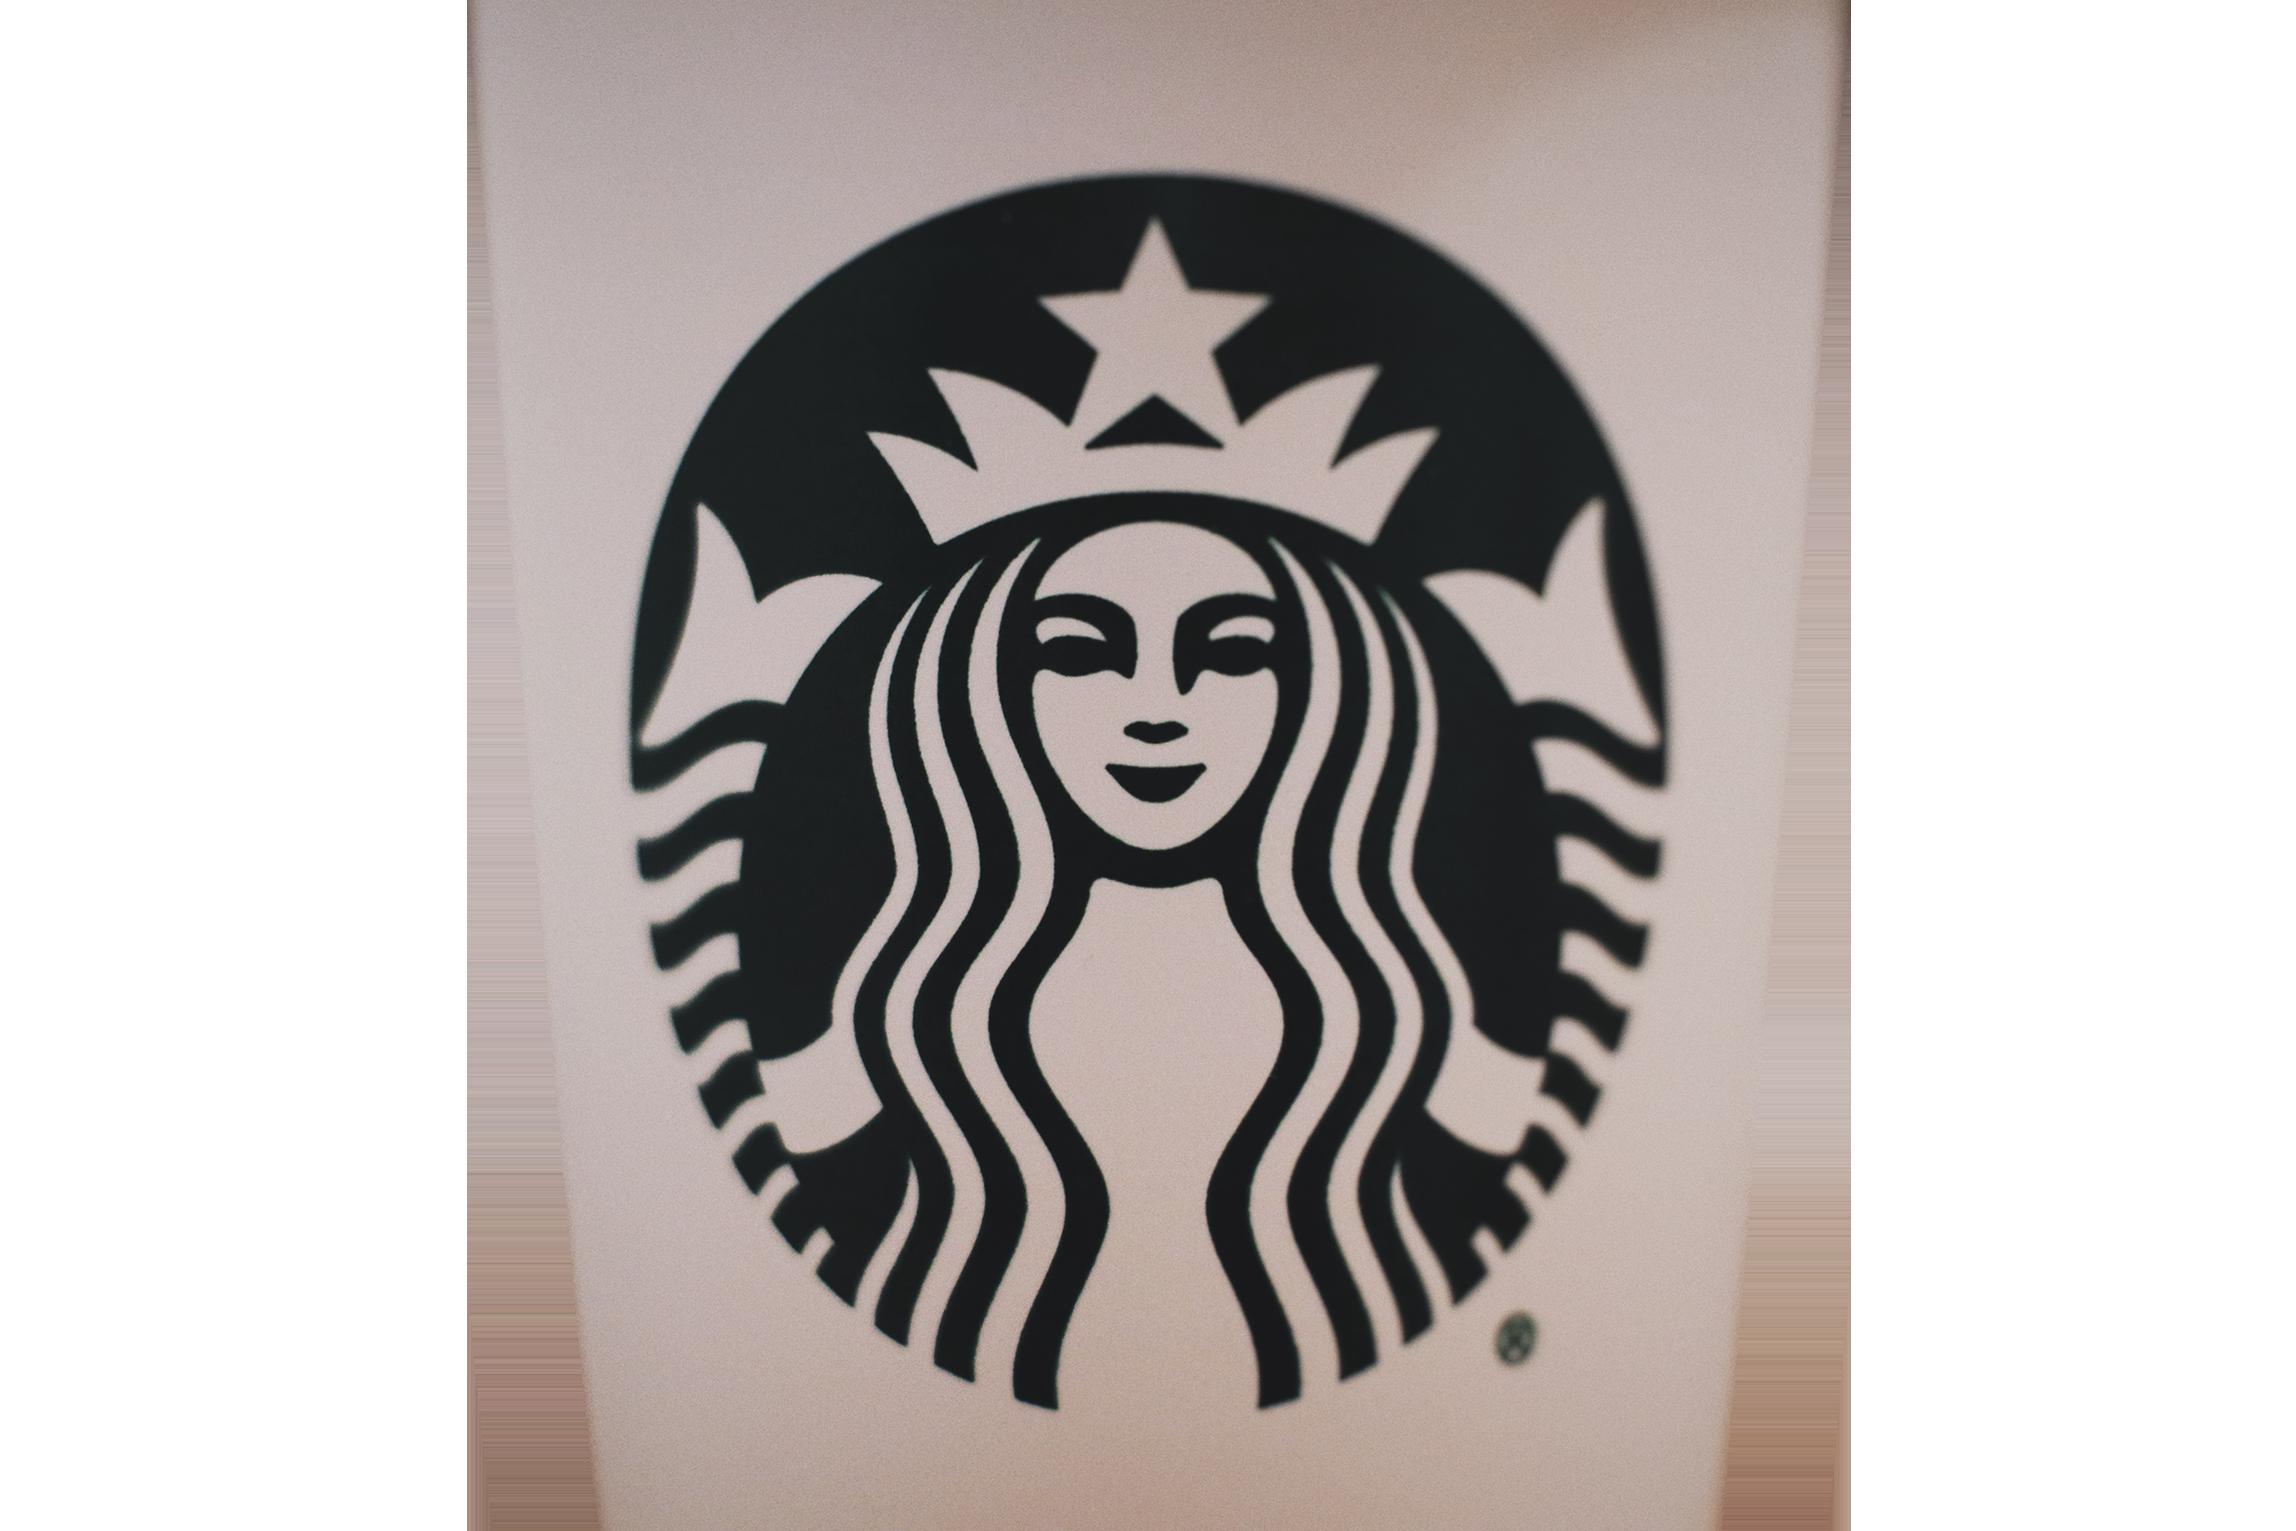 Starbucks company logo transparent background PNG